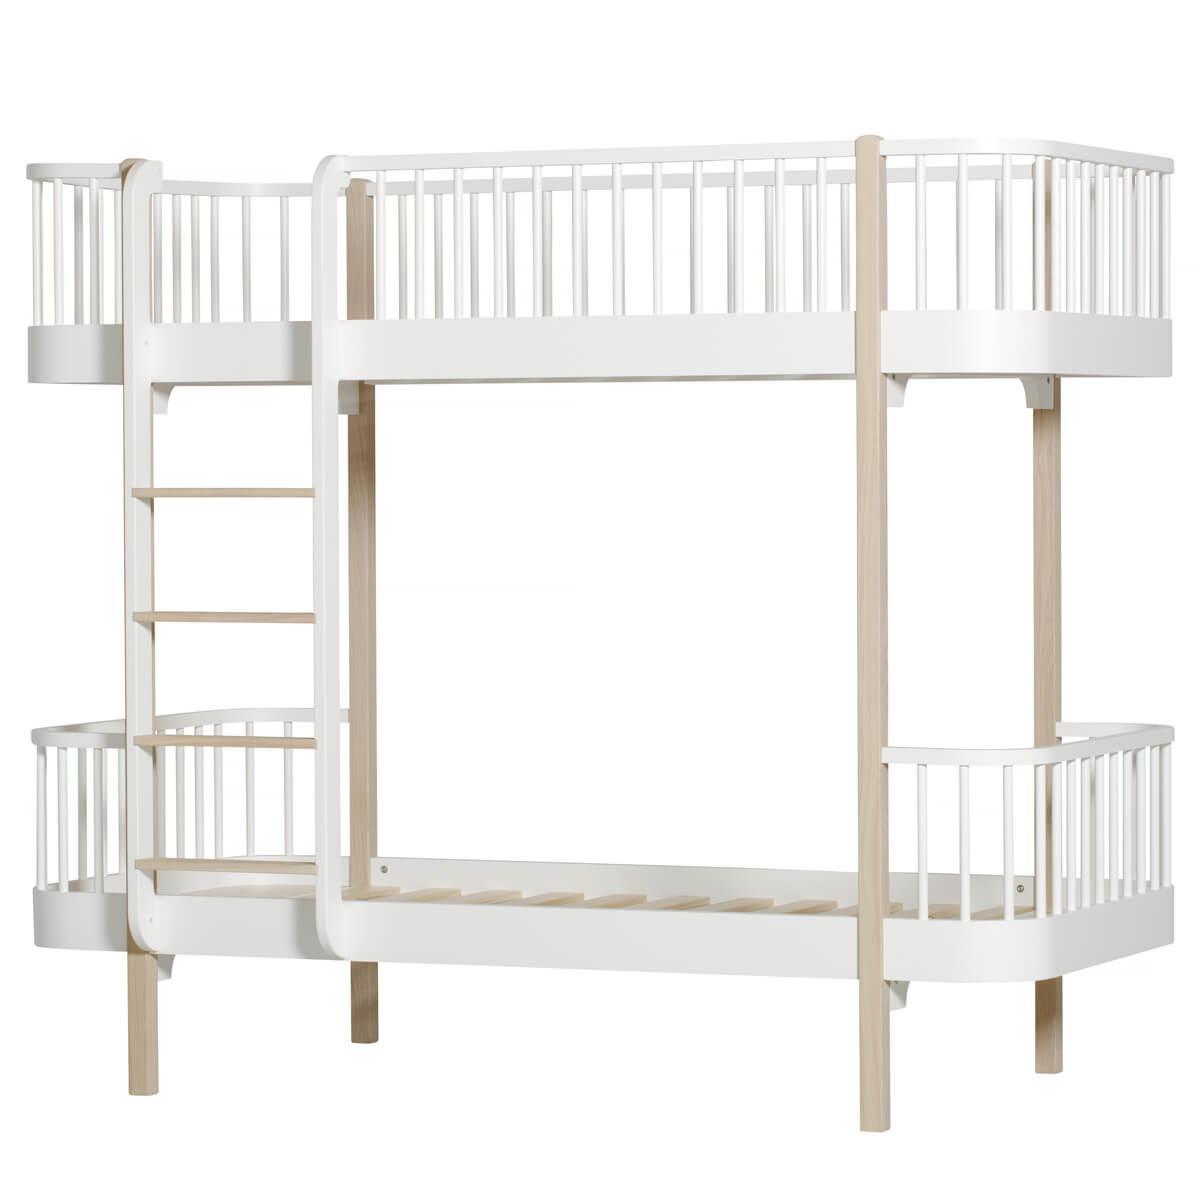 Cama evolutiva literas 90x200cm WOOD ORIGINAL Oliver Furniture blanco-roble